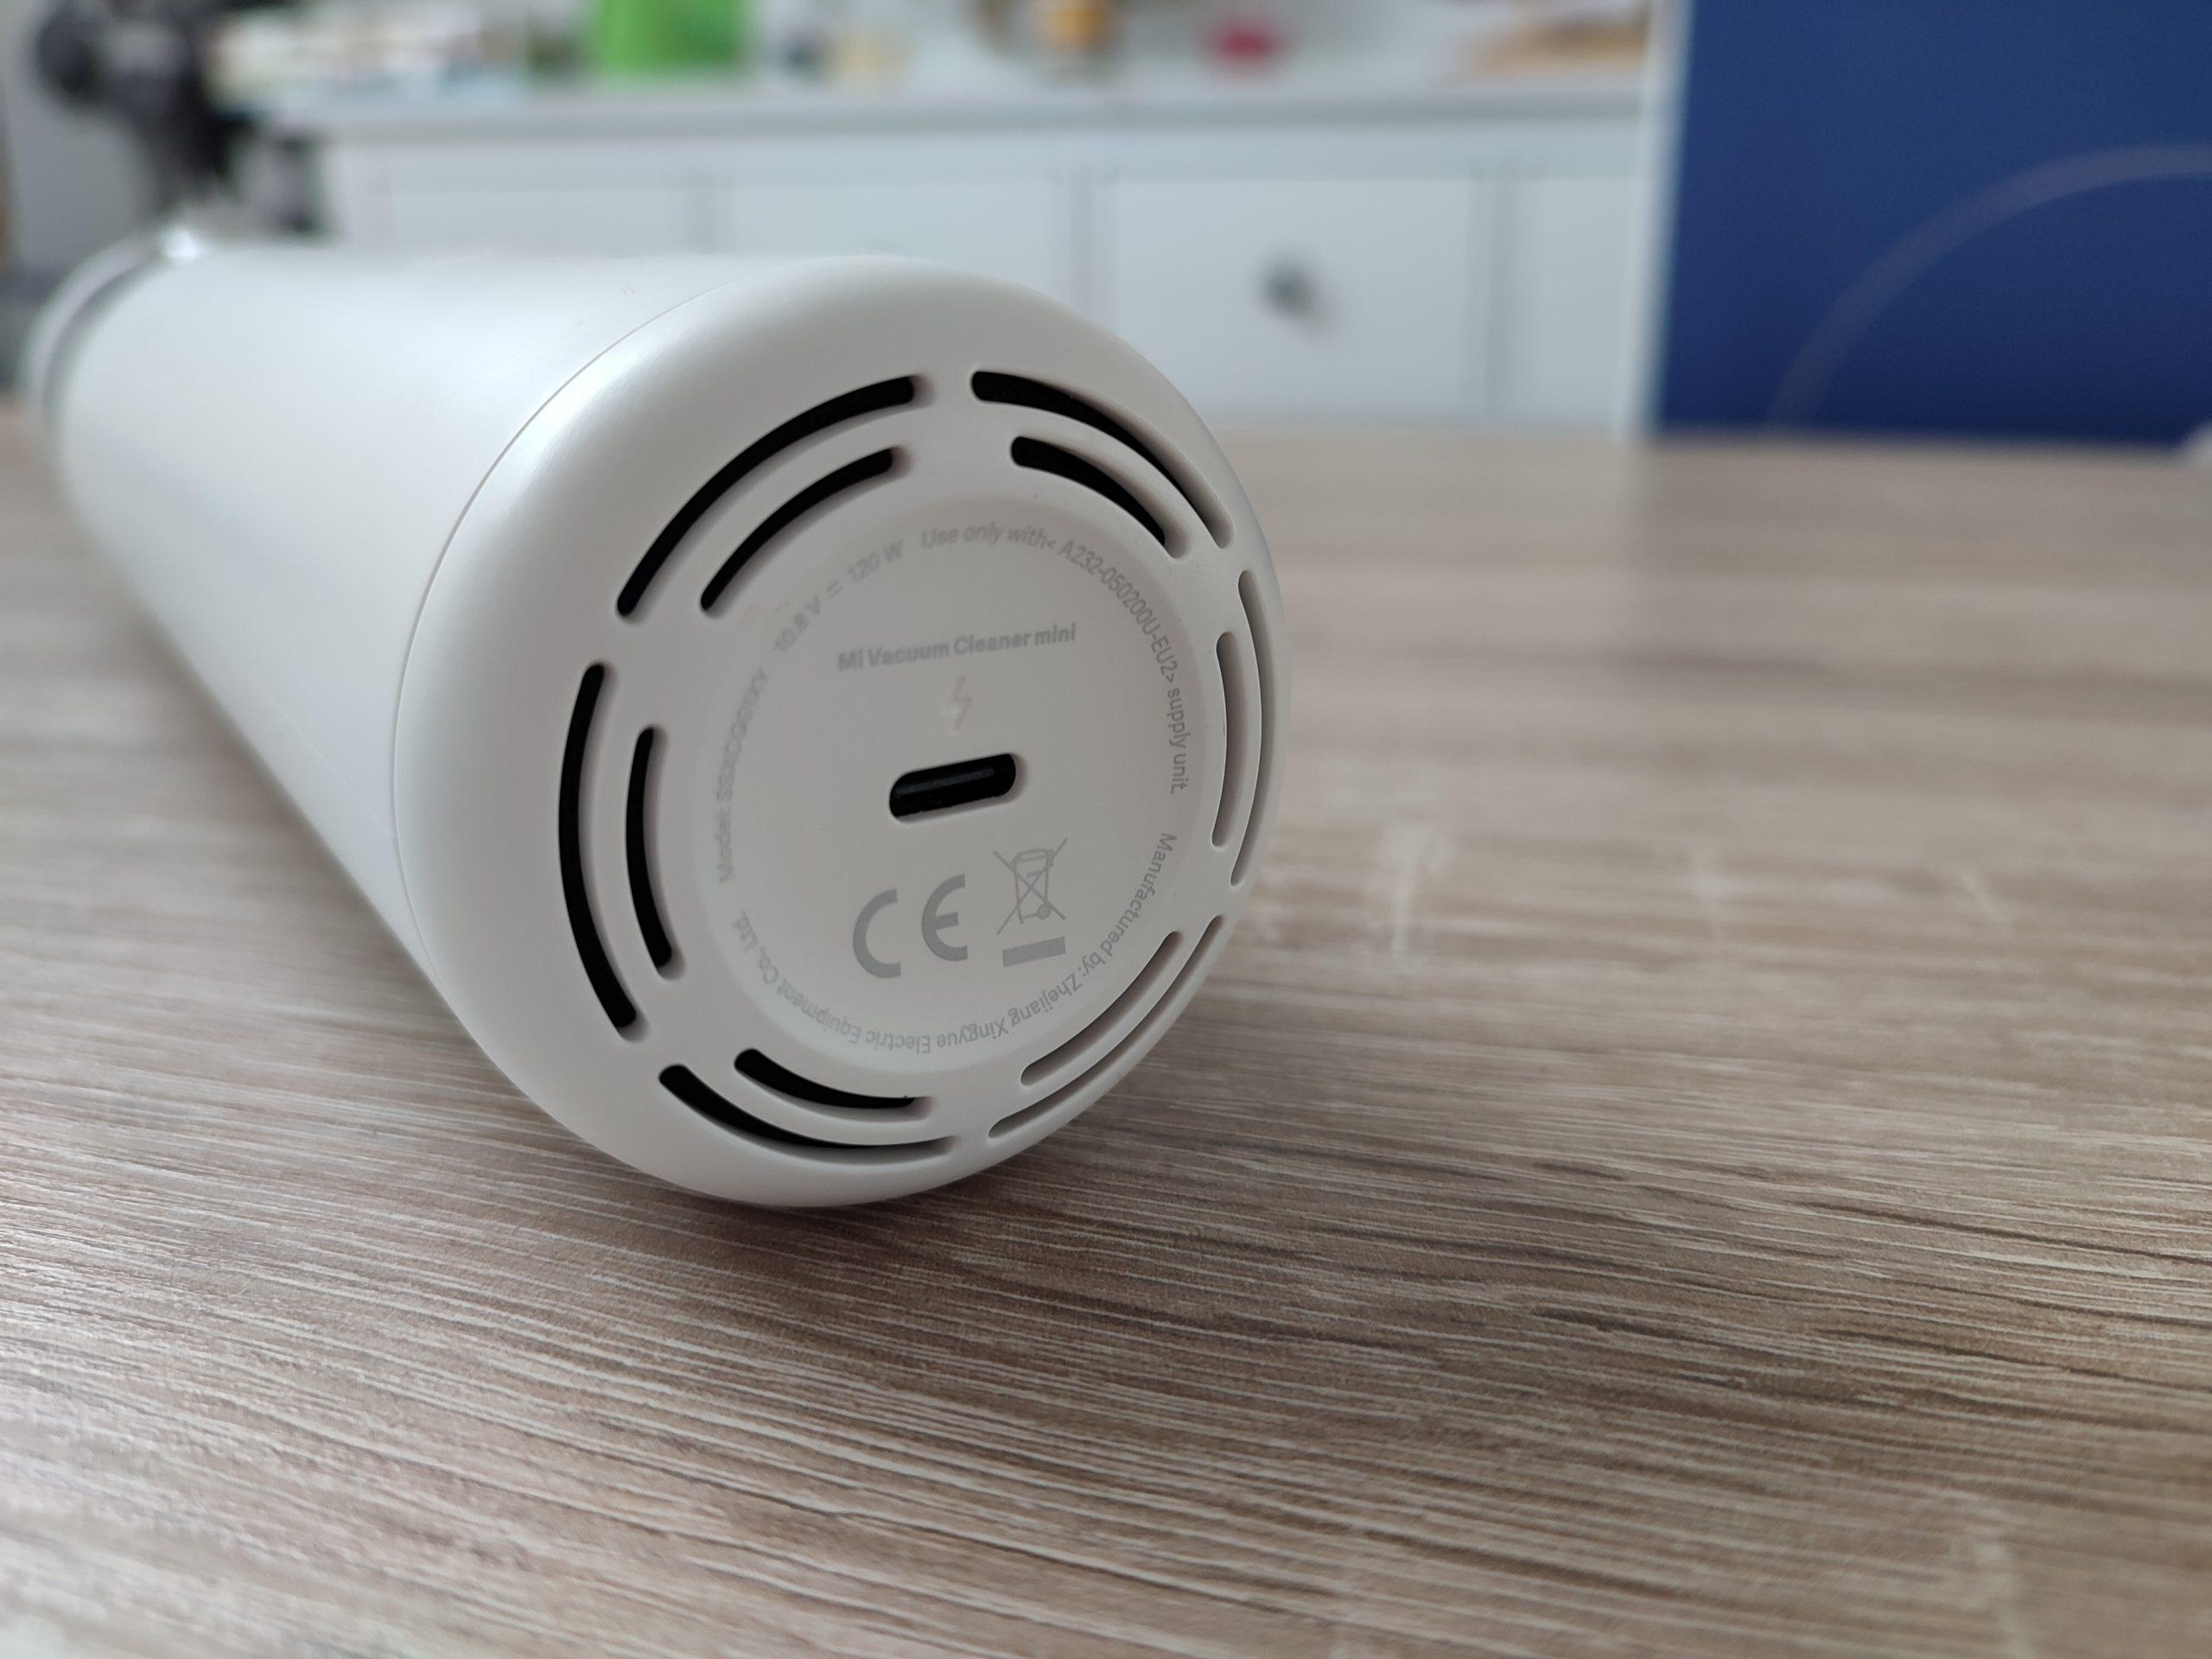 Xiaomi Mi Handsauger Mini Unterseite